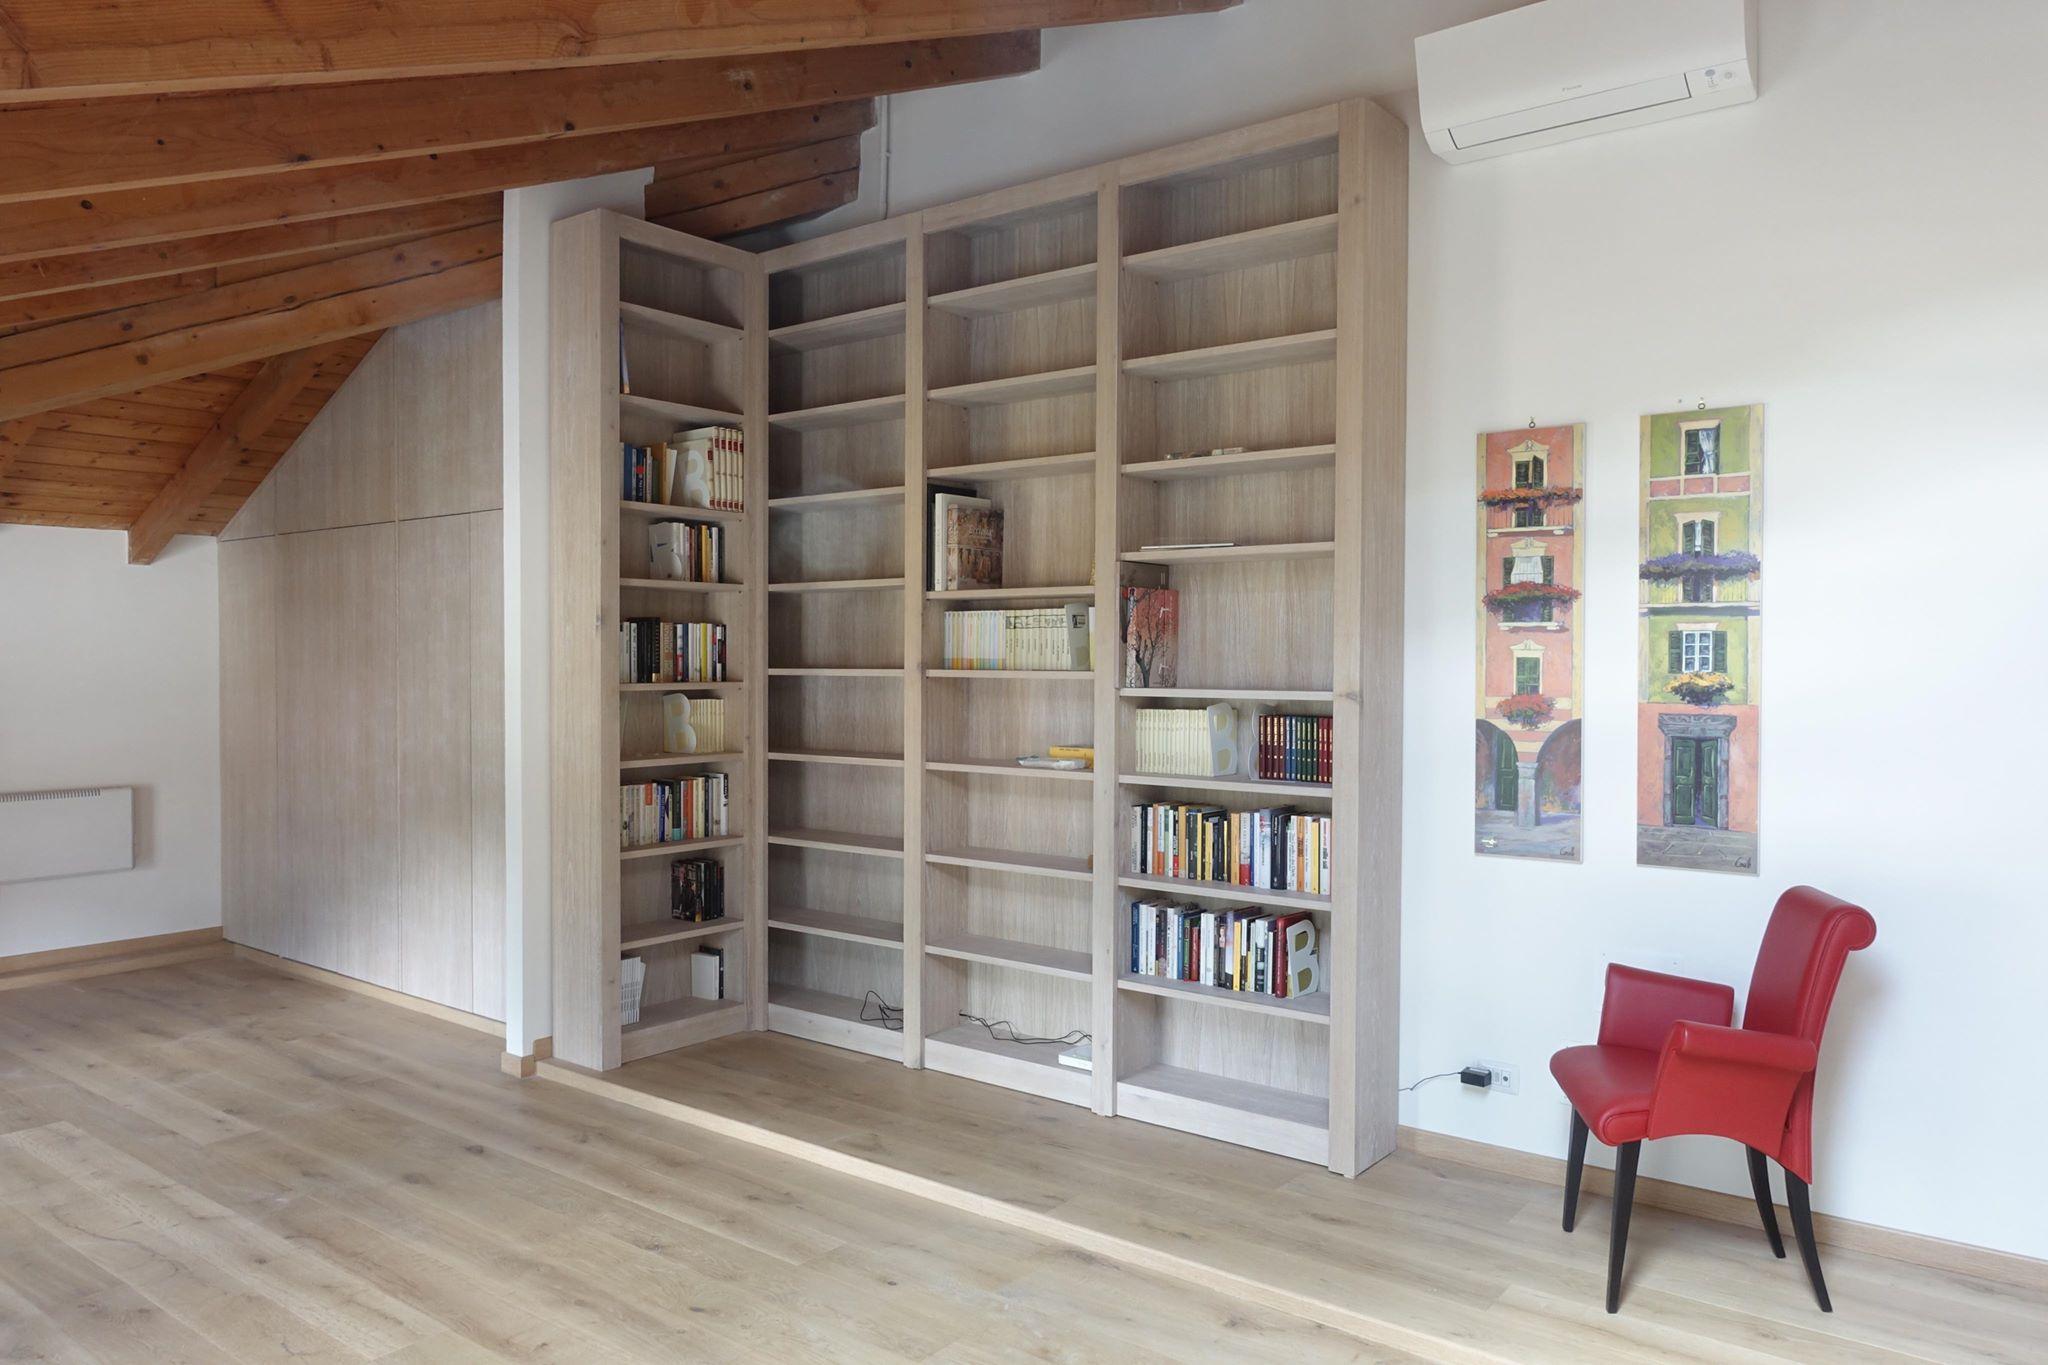 Armadio e libreria soggiorno mansardatomansardalgnoeoltre